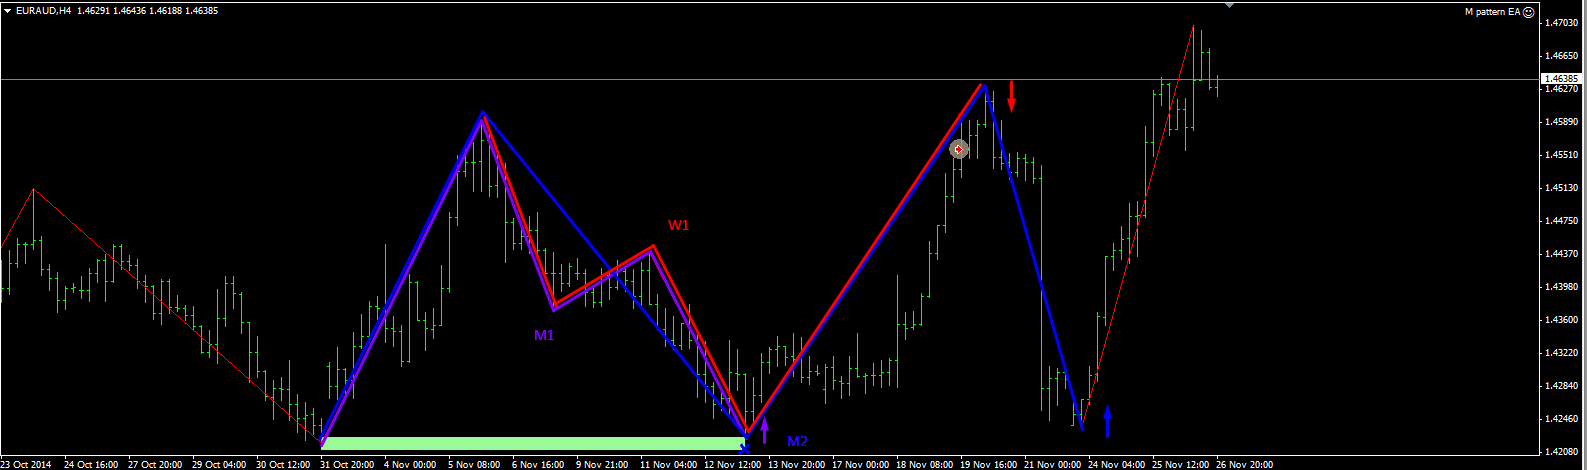 M w pattern forex